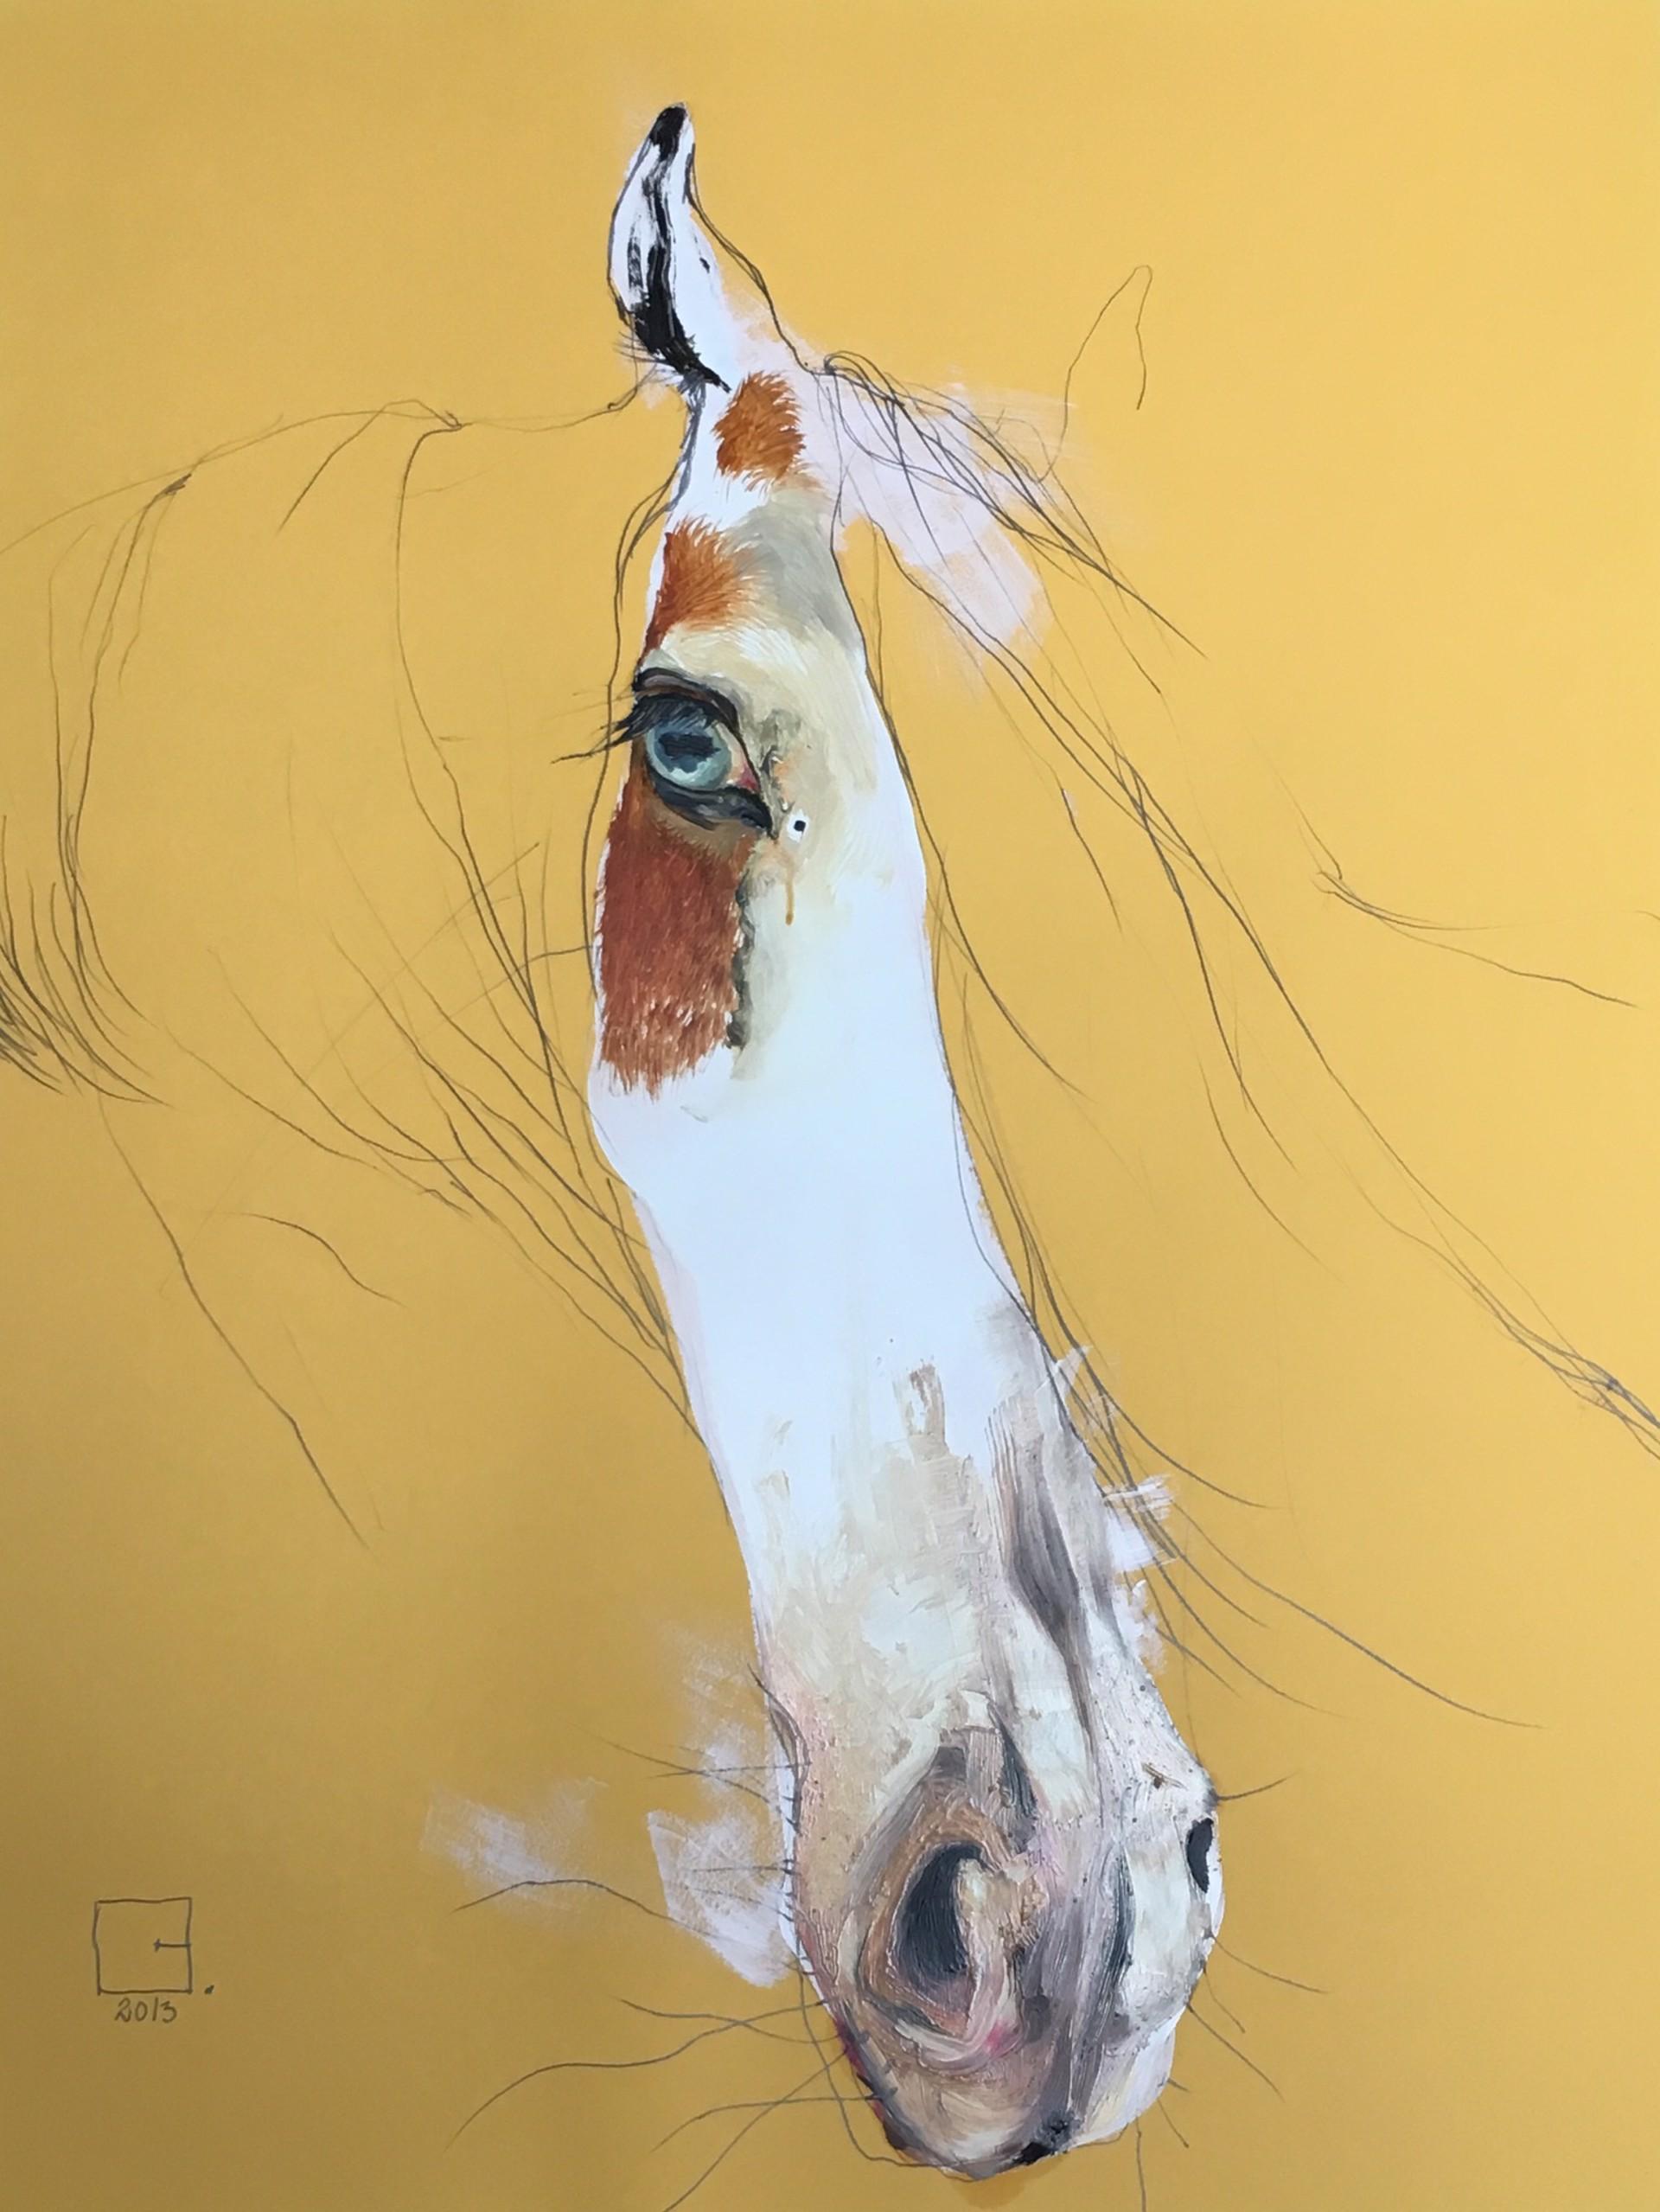 Albino by Olga Gál